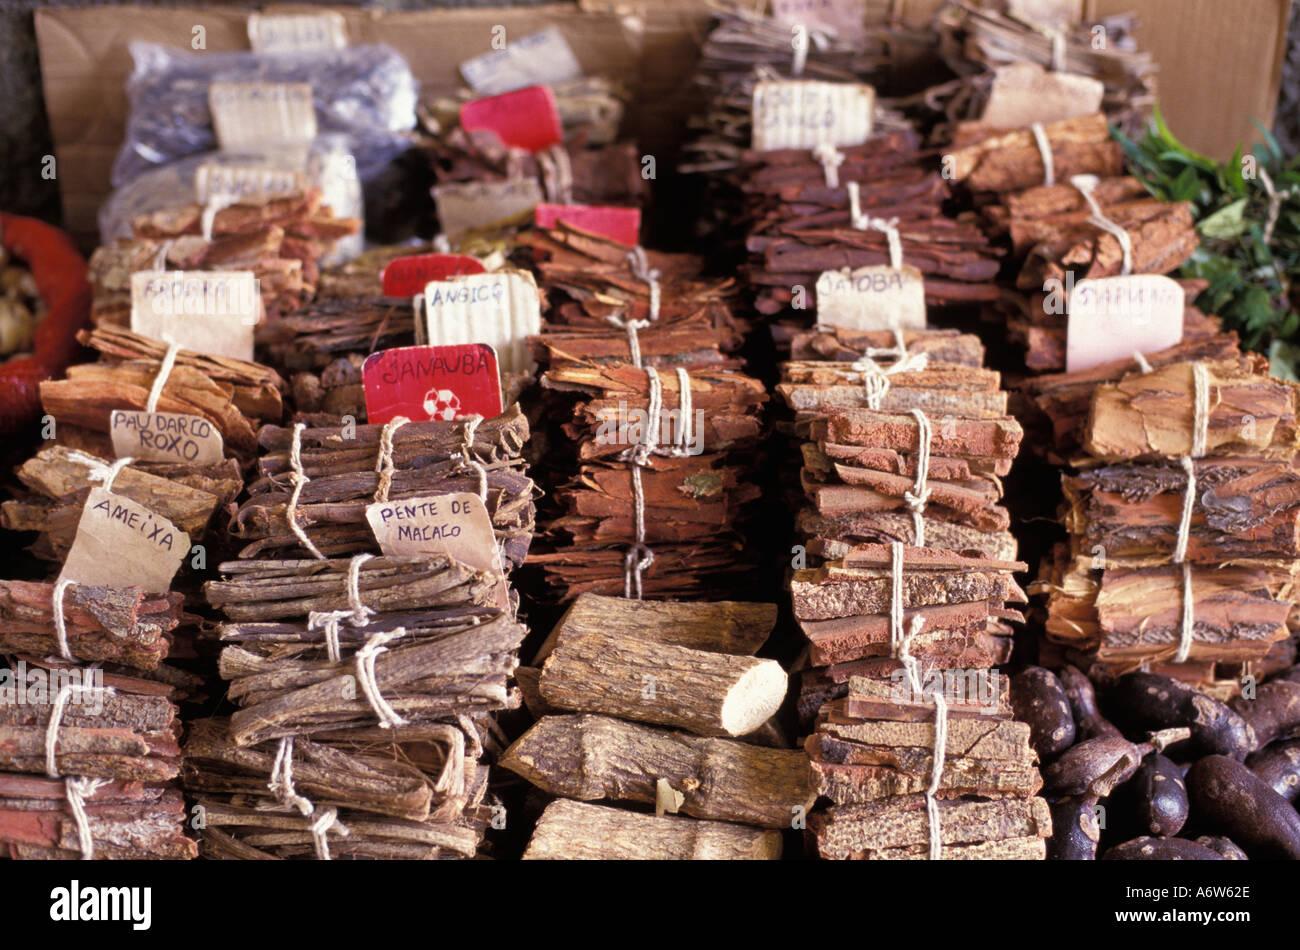 Heilkräuter für den Verkauf in Lateinamerika öffnen Markt Amazonas Brasilien Stockbild